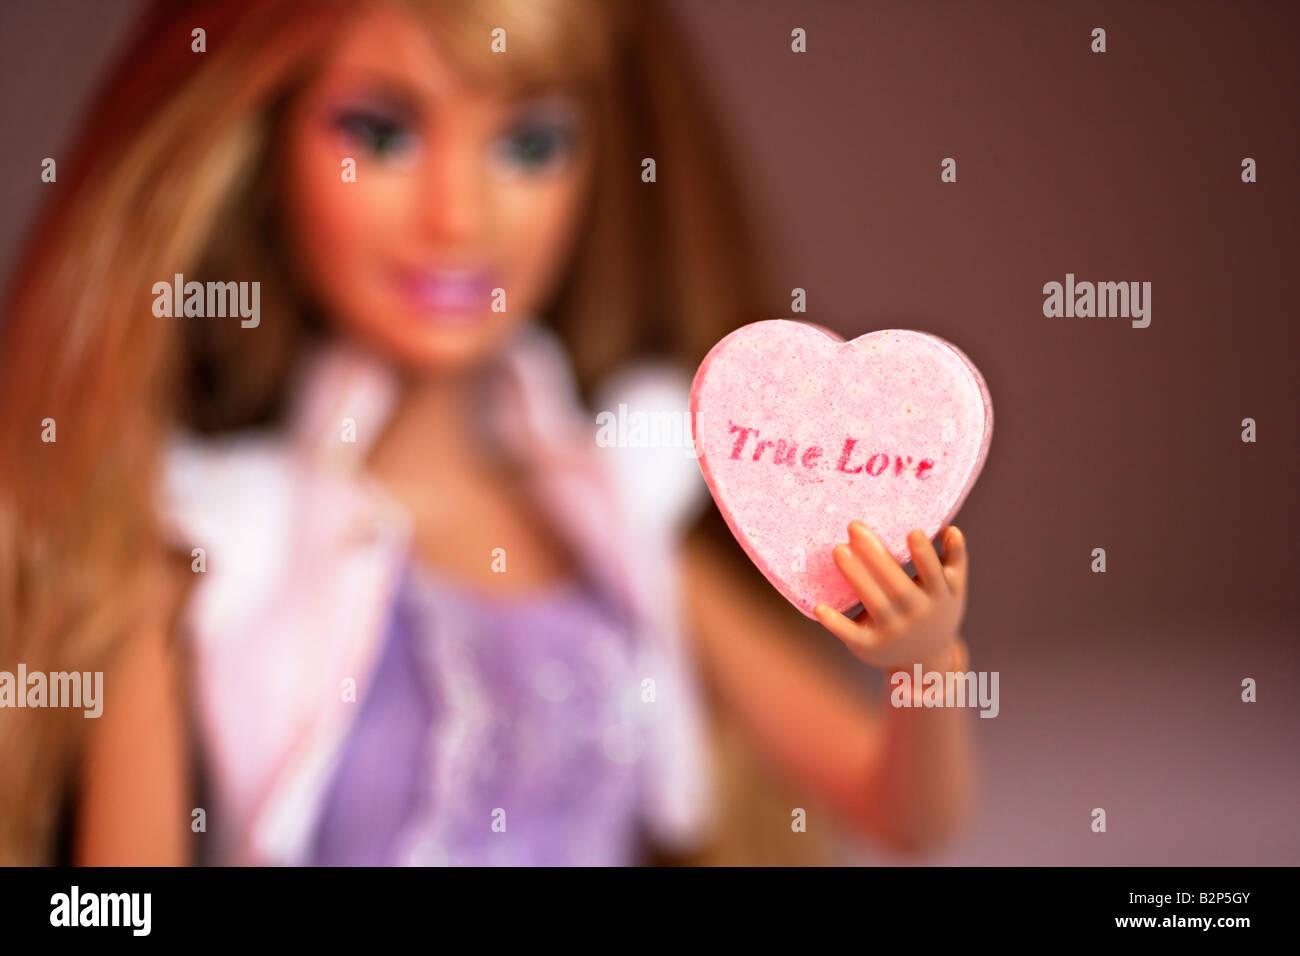 Barbie Doll Series. Barbie finds true love - Stock Image